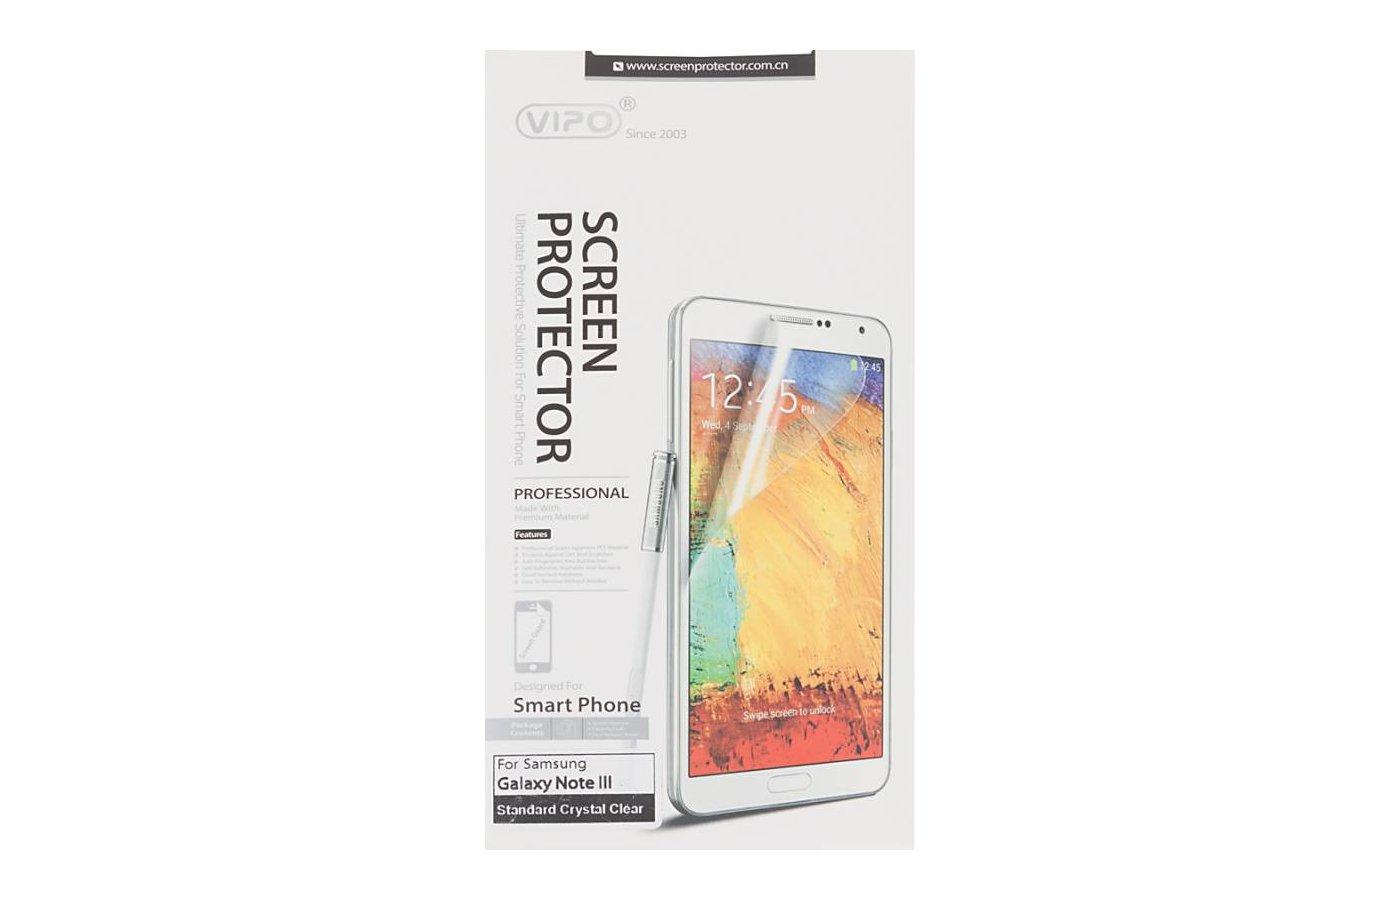 Стекло Vipo пленка для Galaxy Note 3 прозрачная